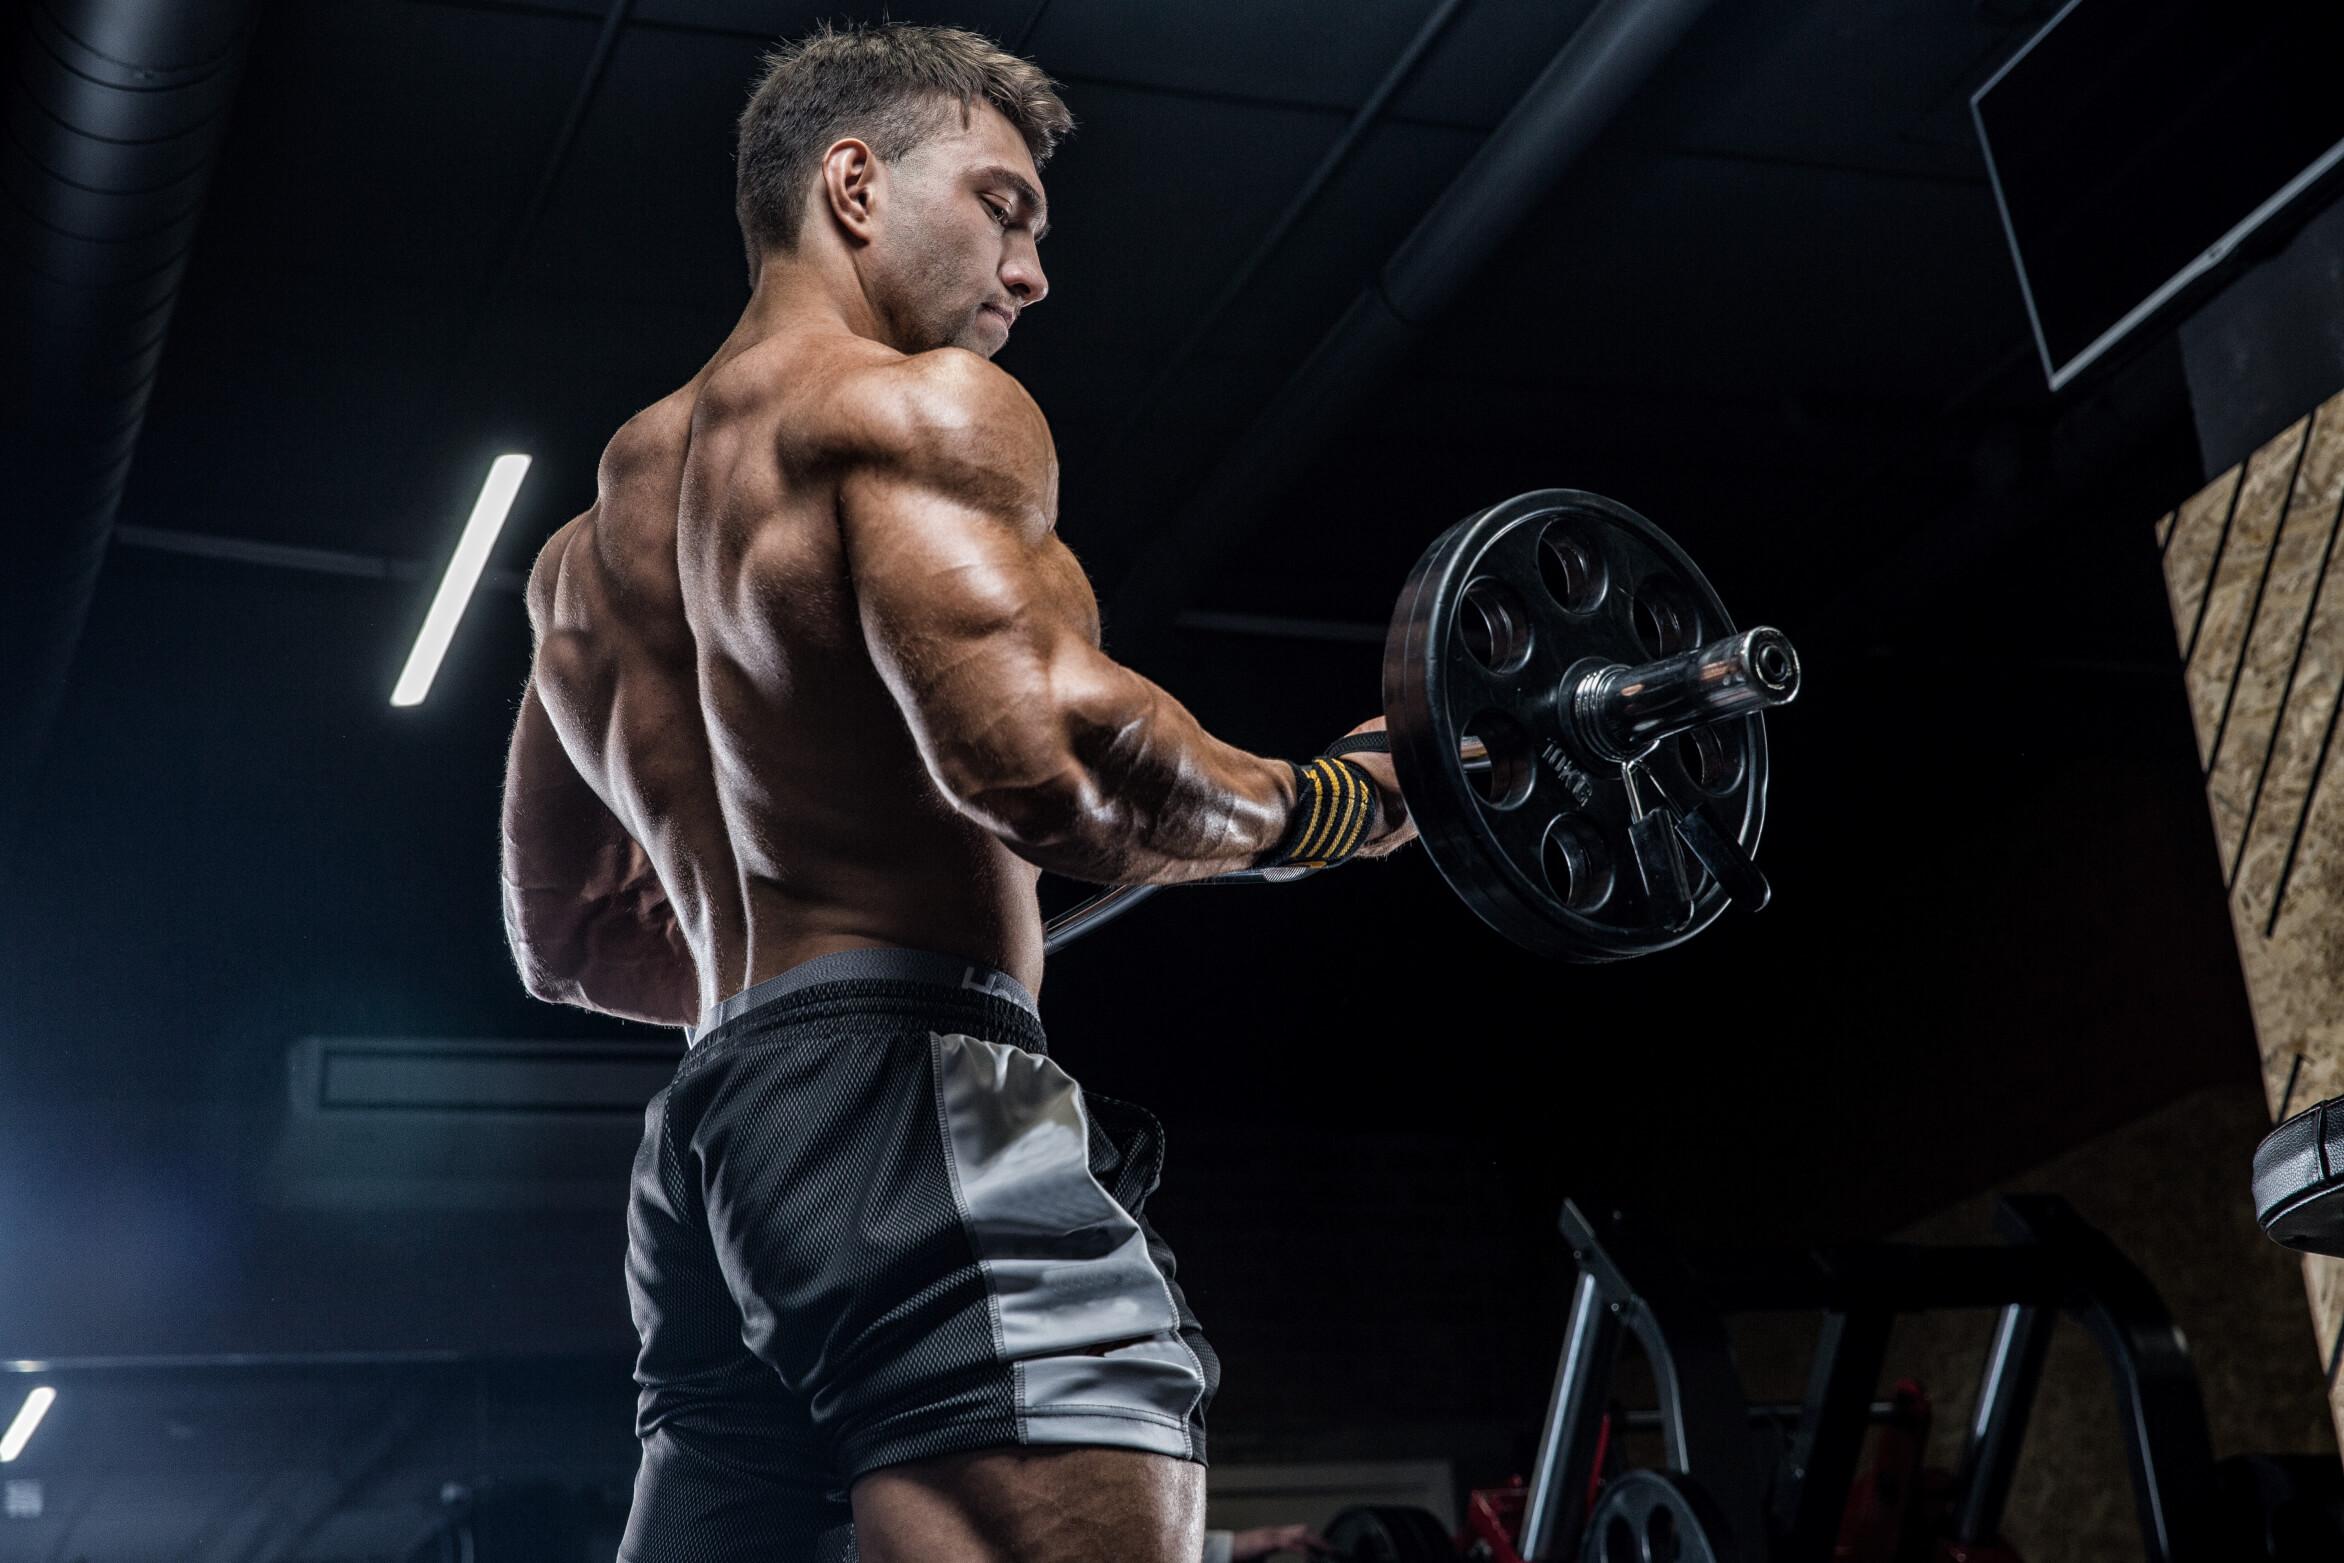 File:Bodybuilding-training-program1.jpg